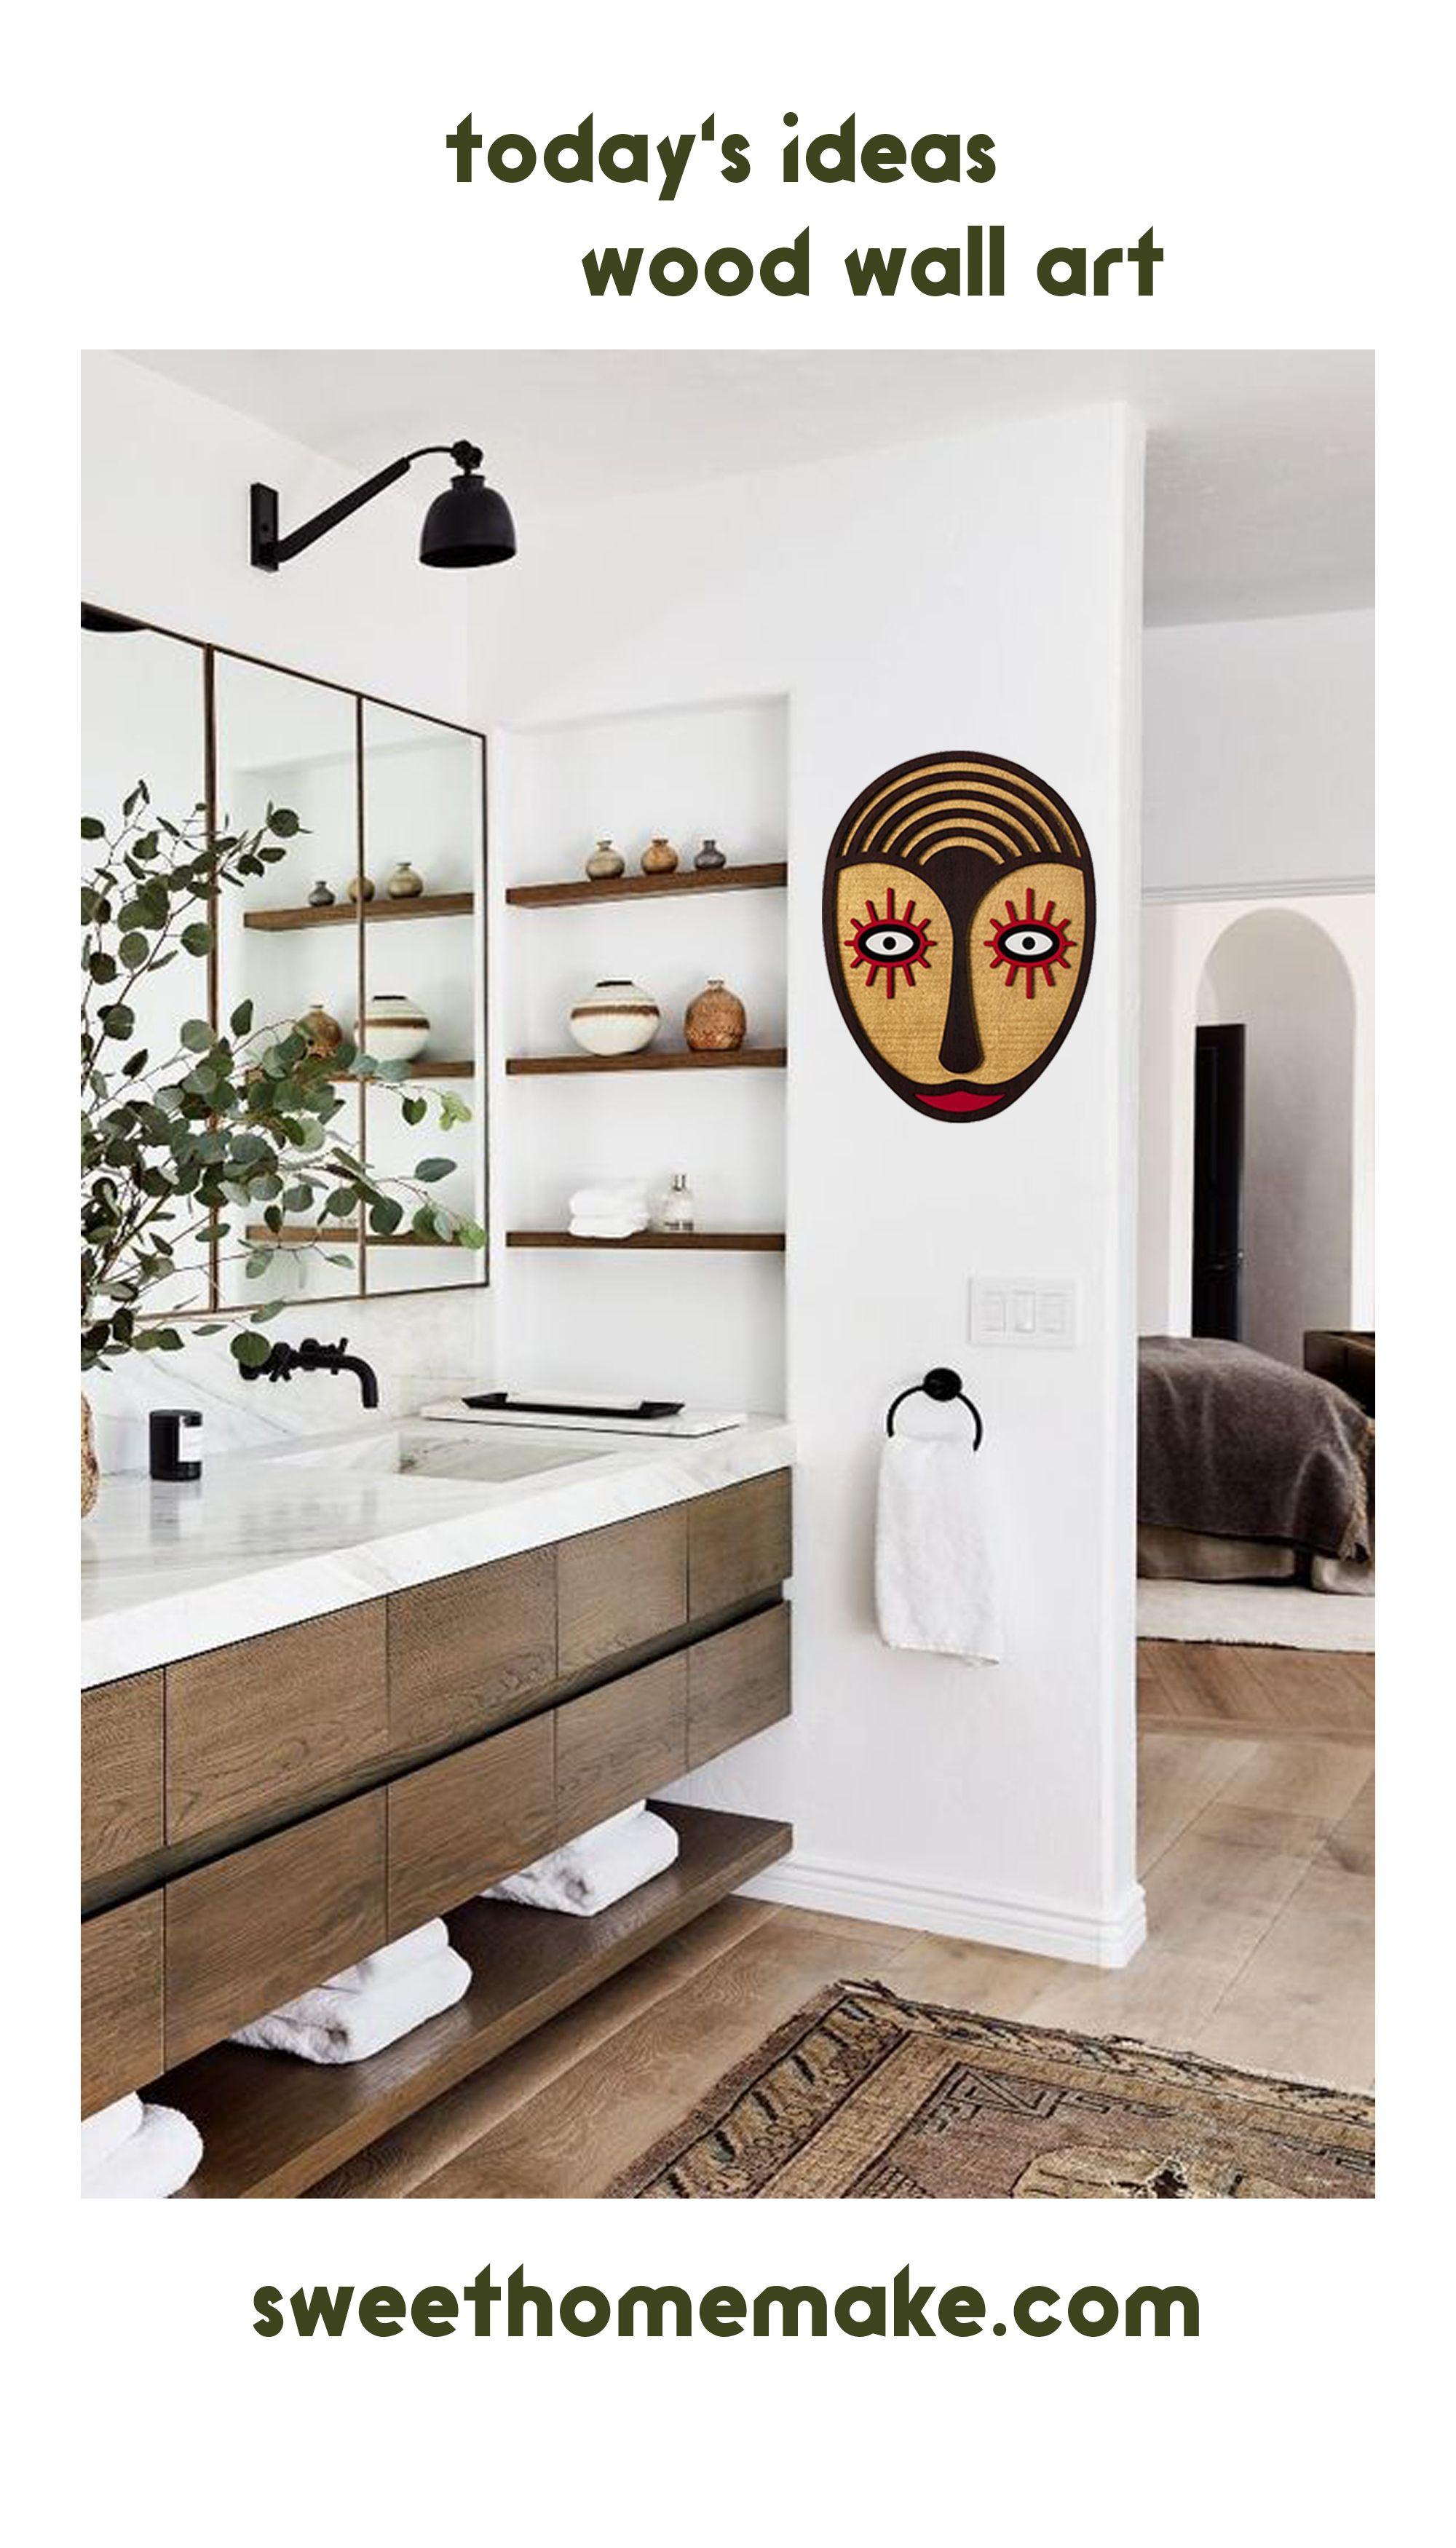 Handmade Creative Boho Wall Art With Wooden Bohemian Home Decor Bathroom Design Decor Modern Bathroom Design Bathroom Wall Decor